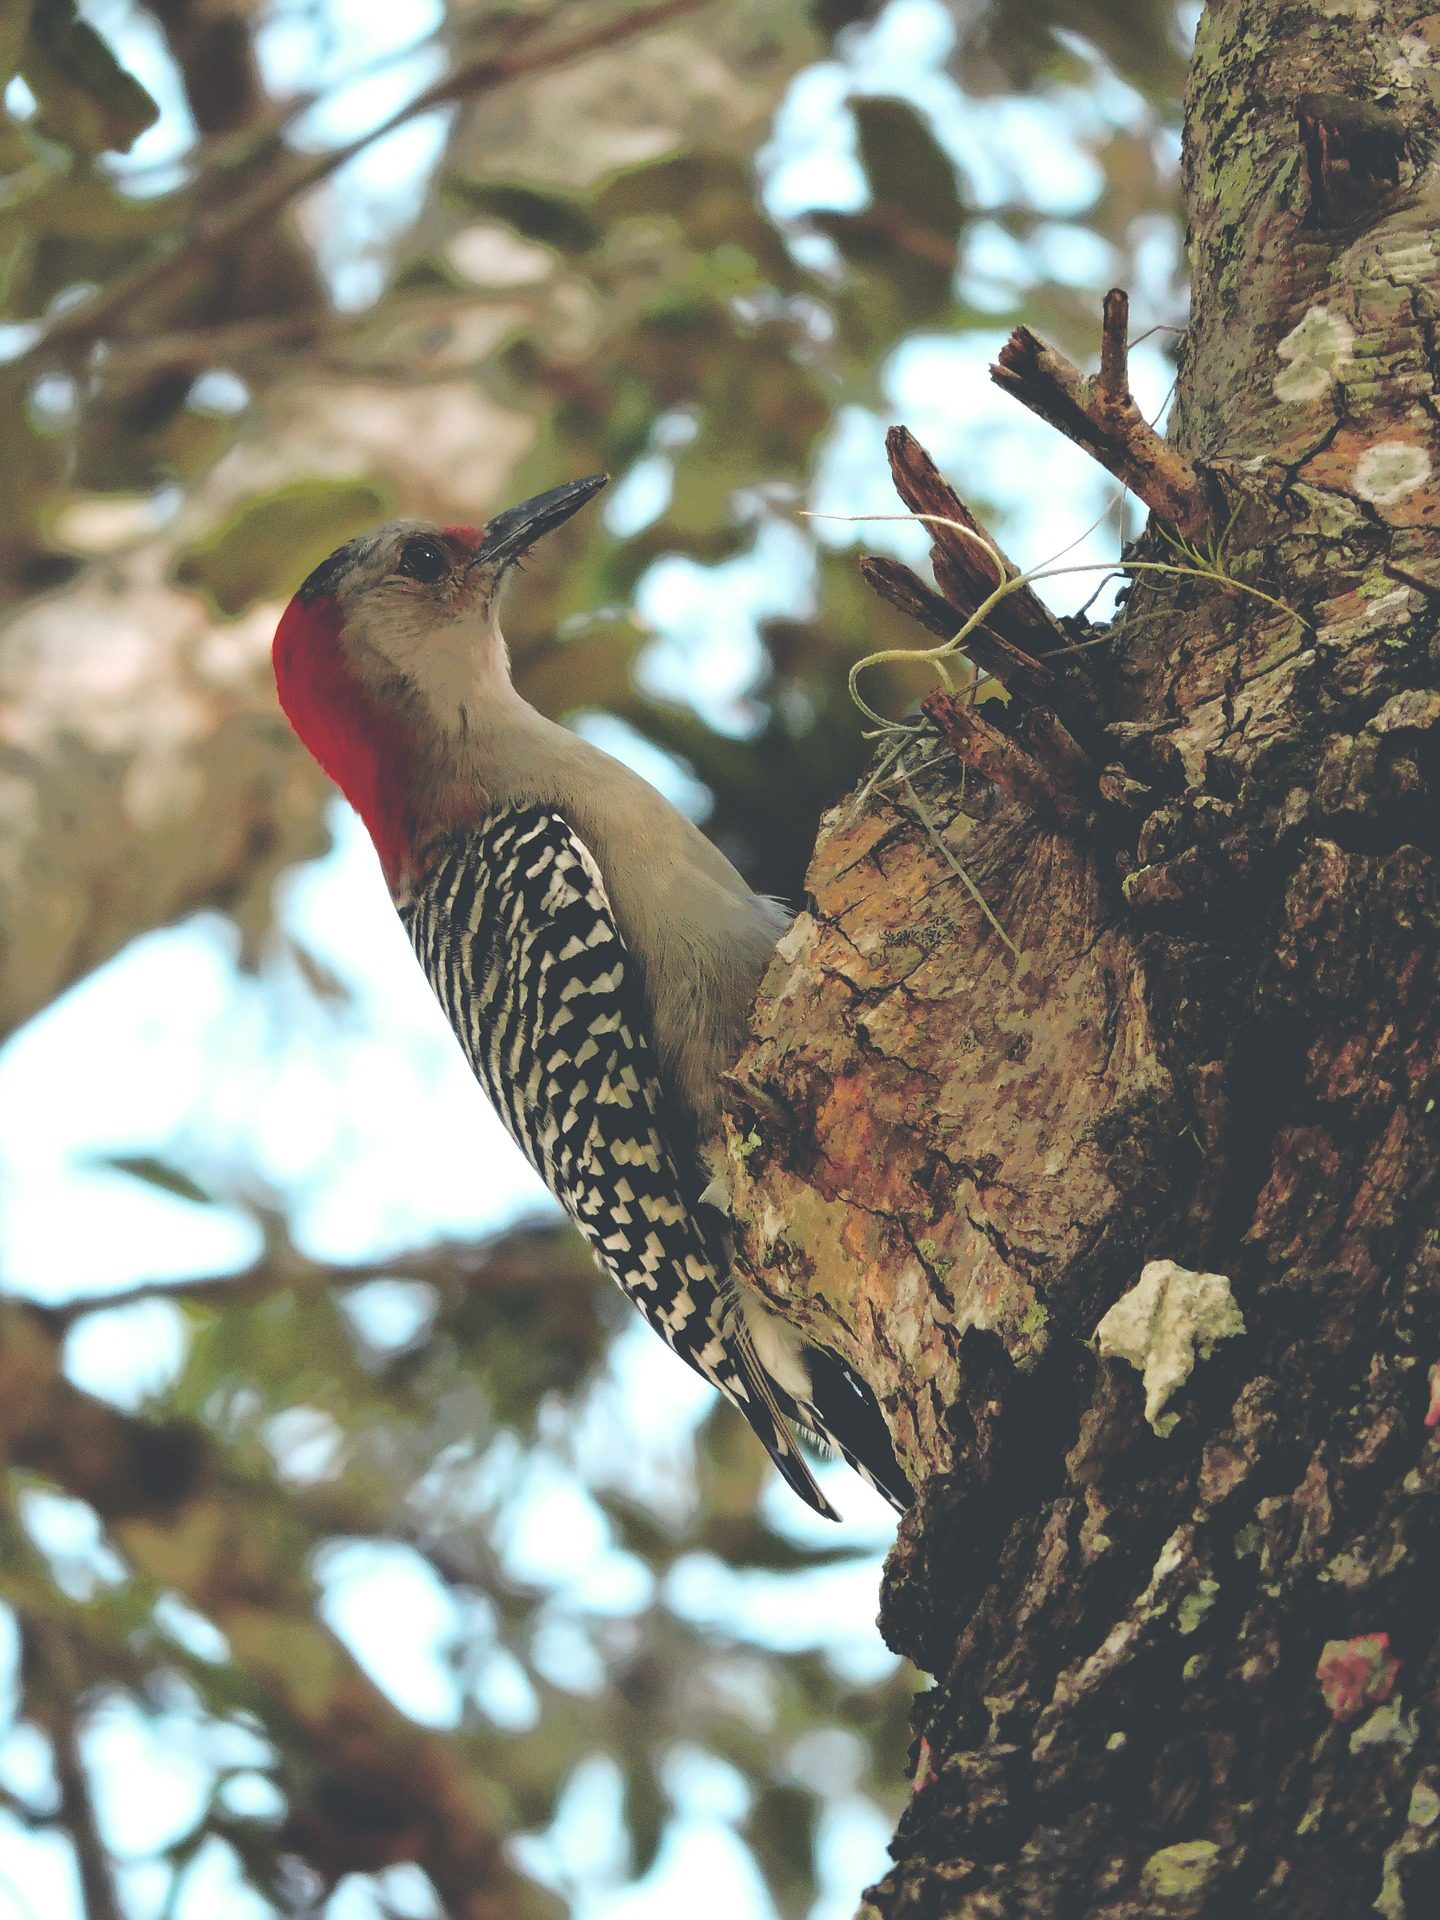 pájaro, carpintero, ave, pico, árbol, plumaje - Fondos de Pantalla HD - professor-falken.com